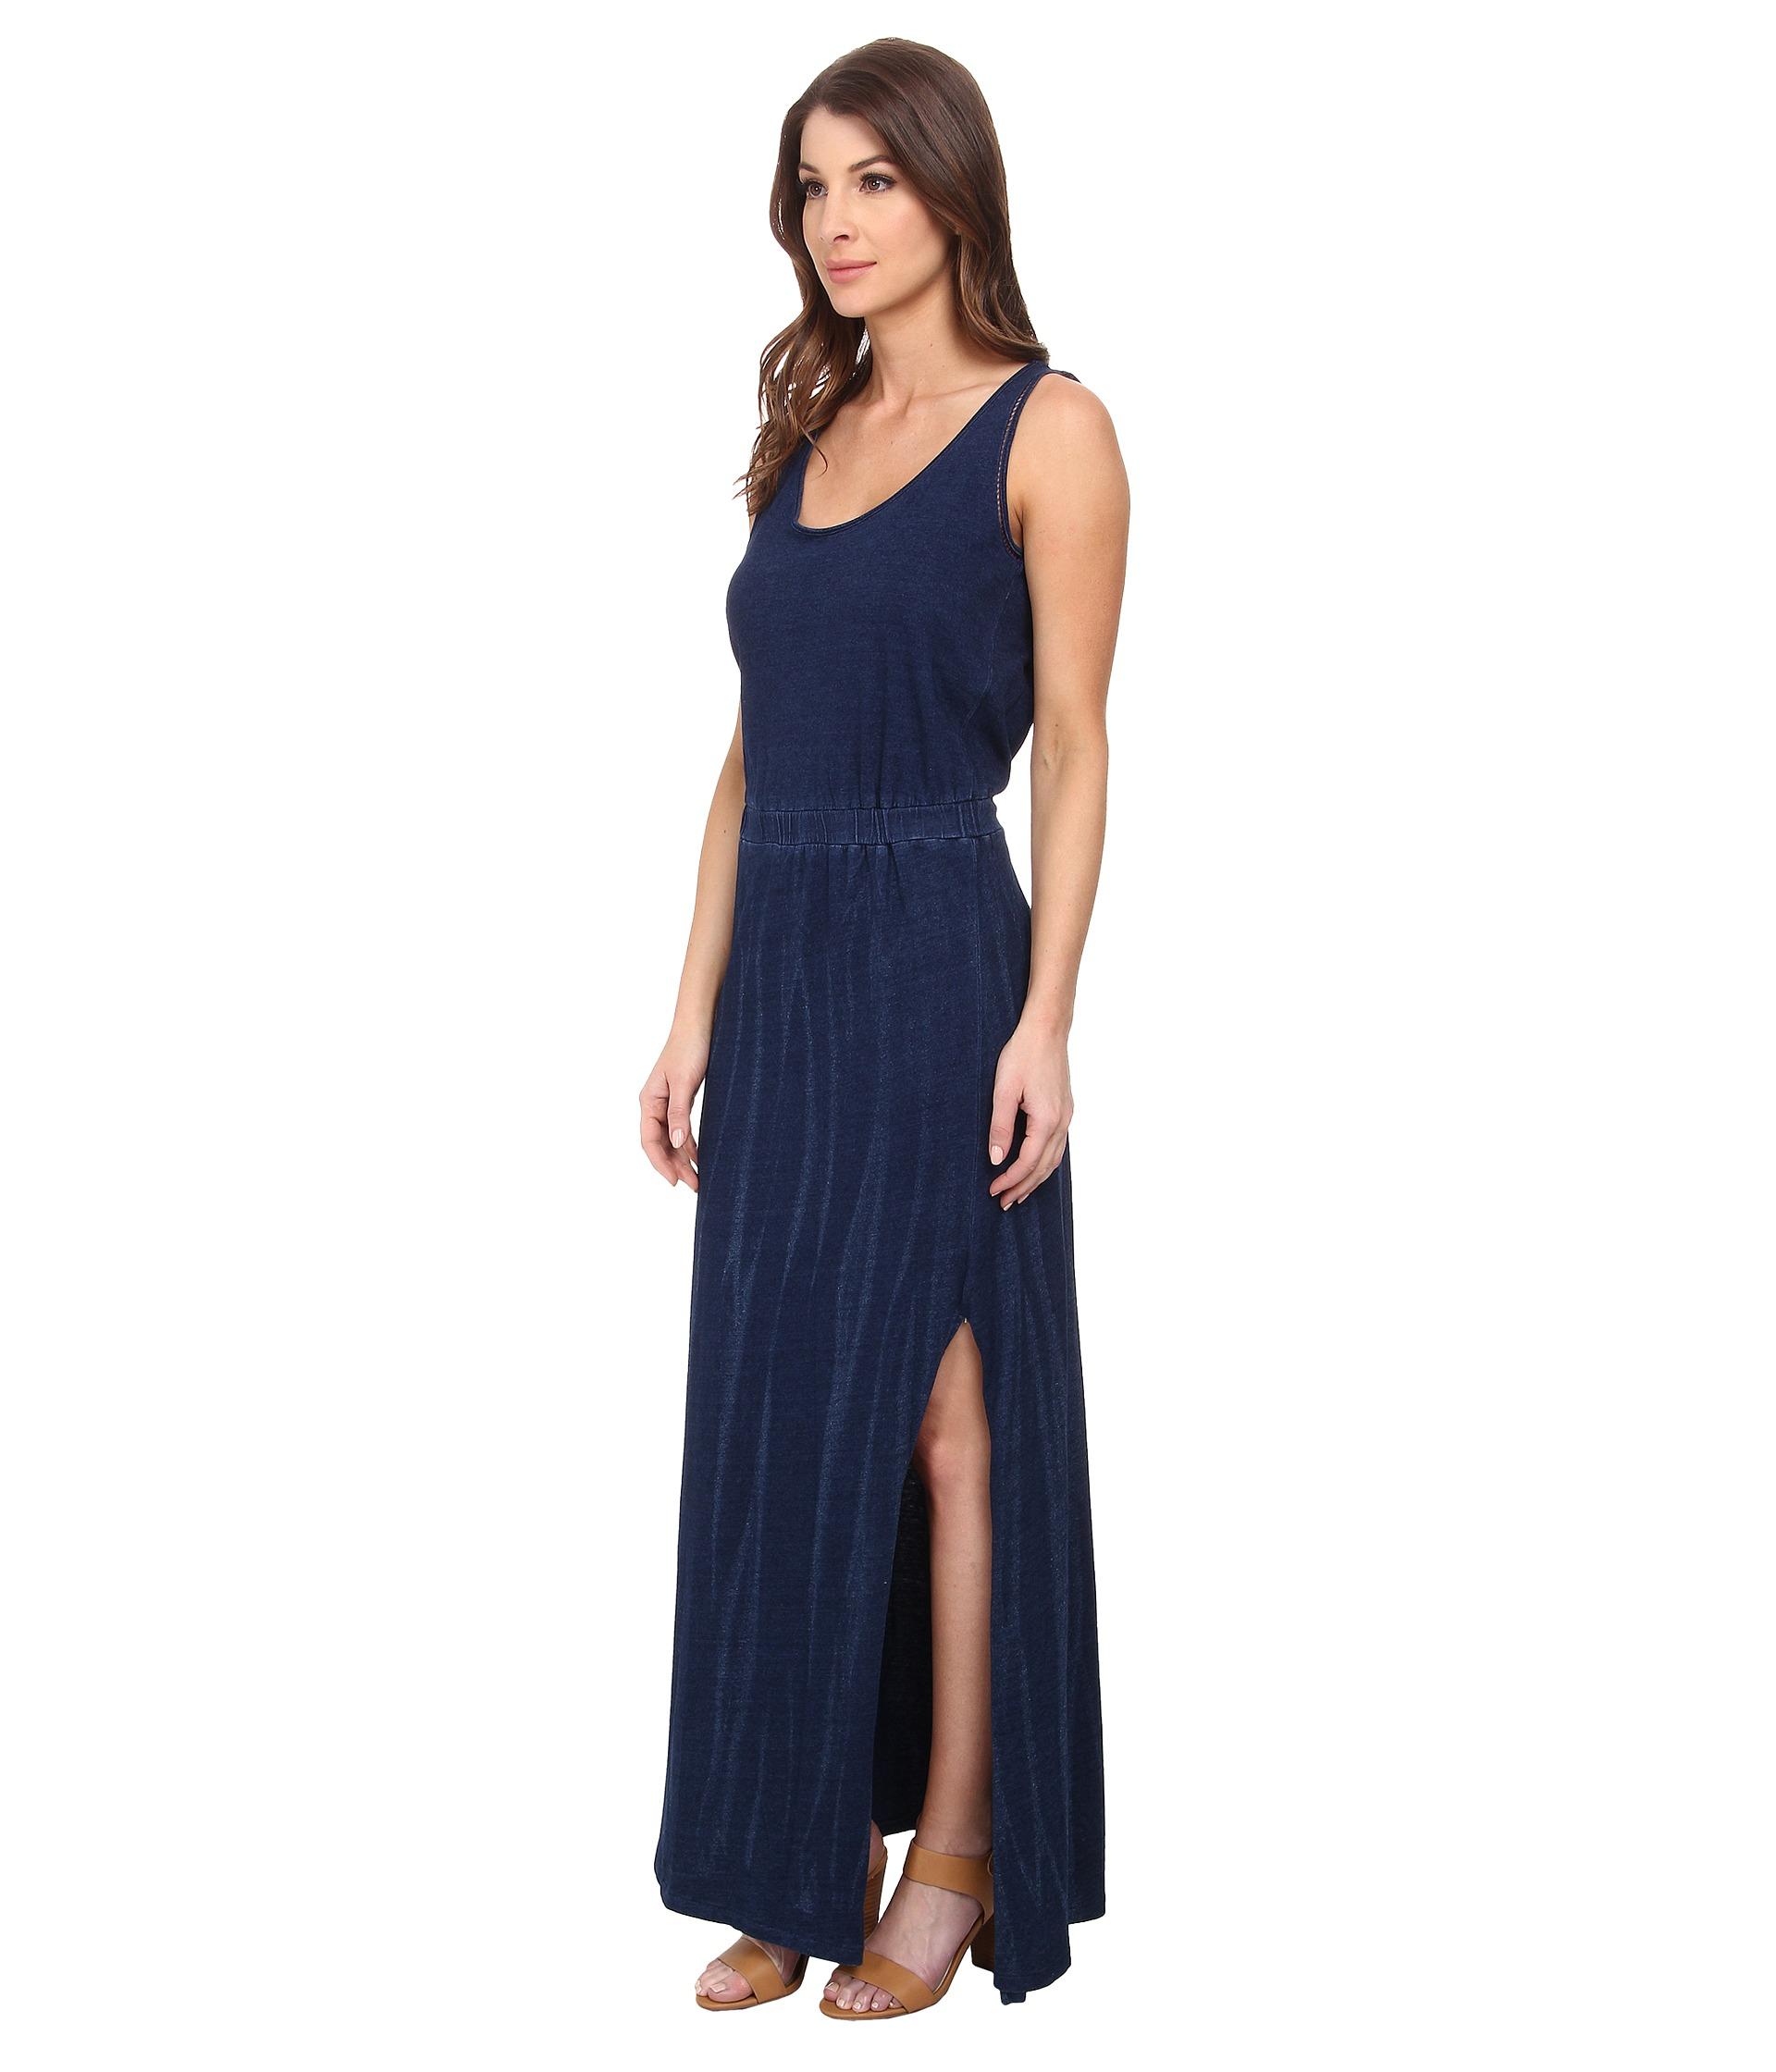 Dkny Knit Denim Maxi Dress With Mesh in Blue  Lyst